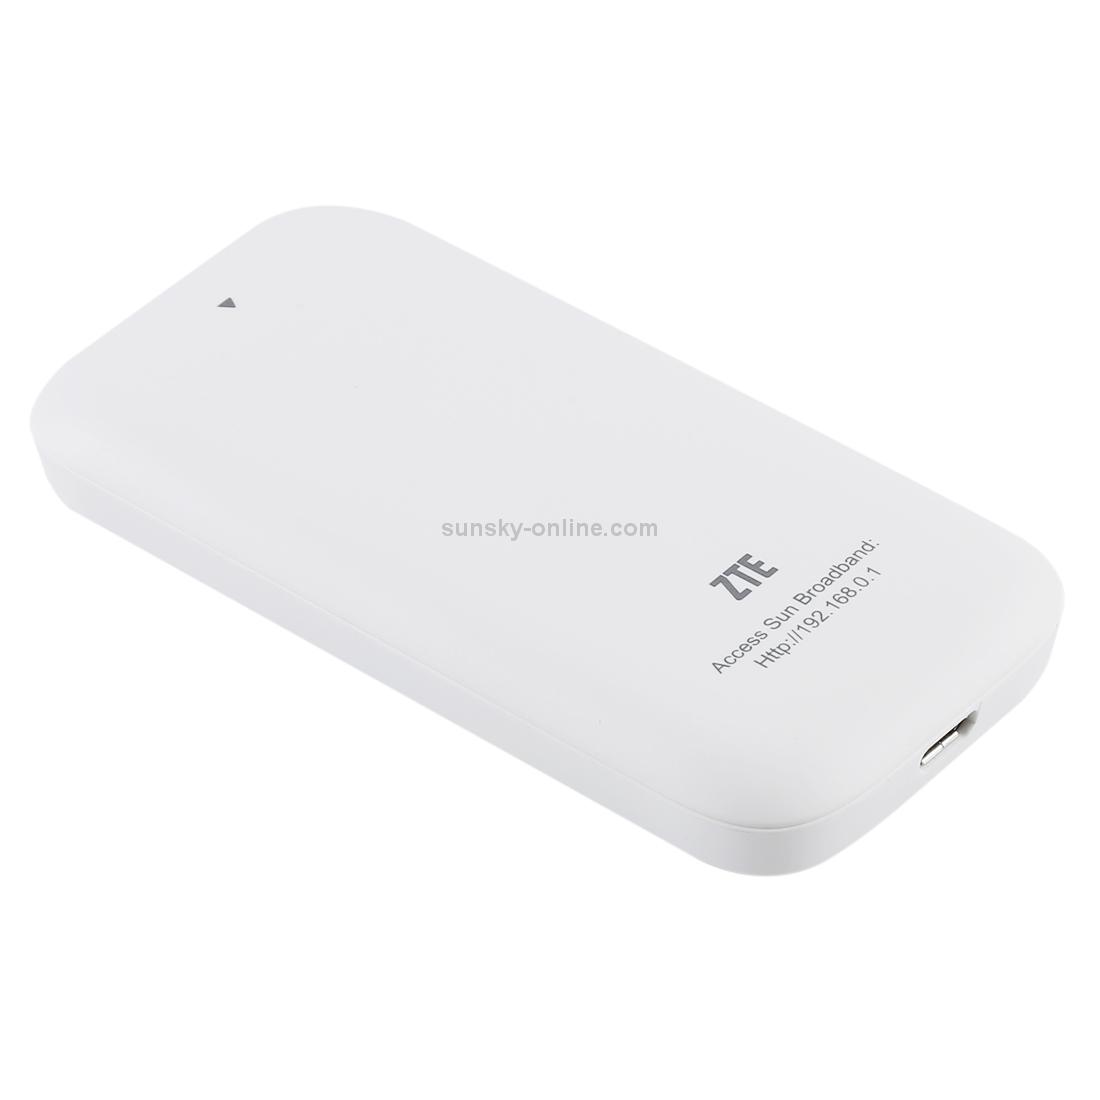 SUNSKY - For ZTE MF65M 7 2Mbps 3G Mobile Hotspot Router